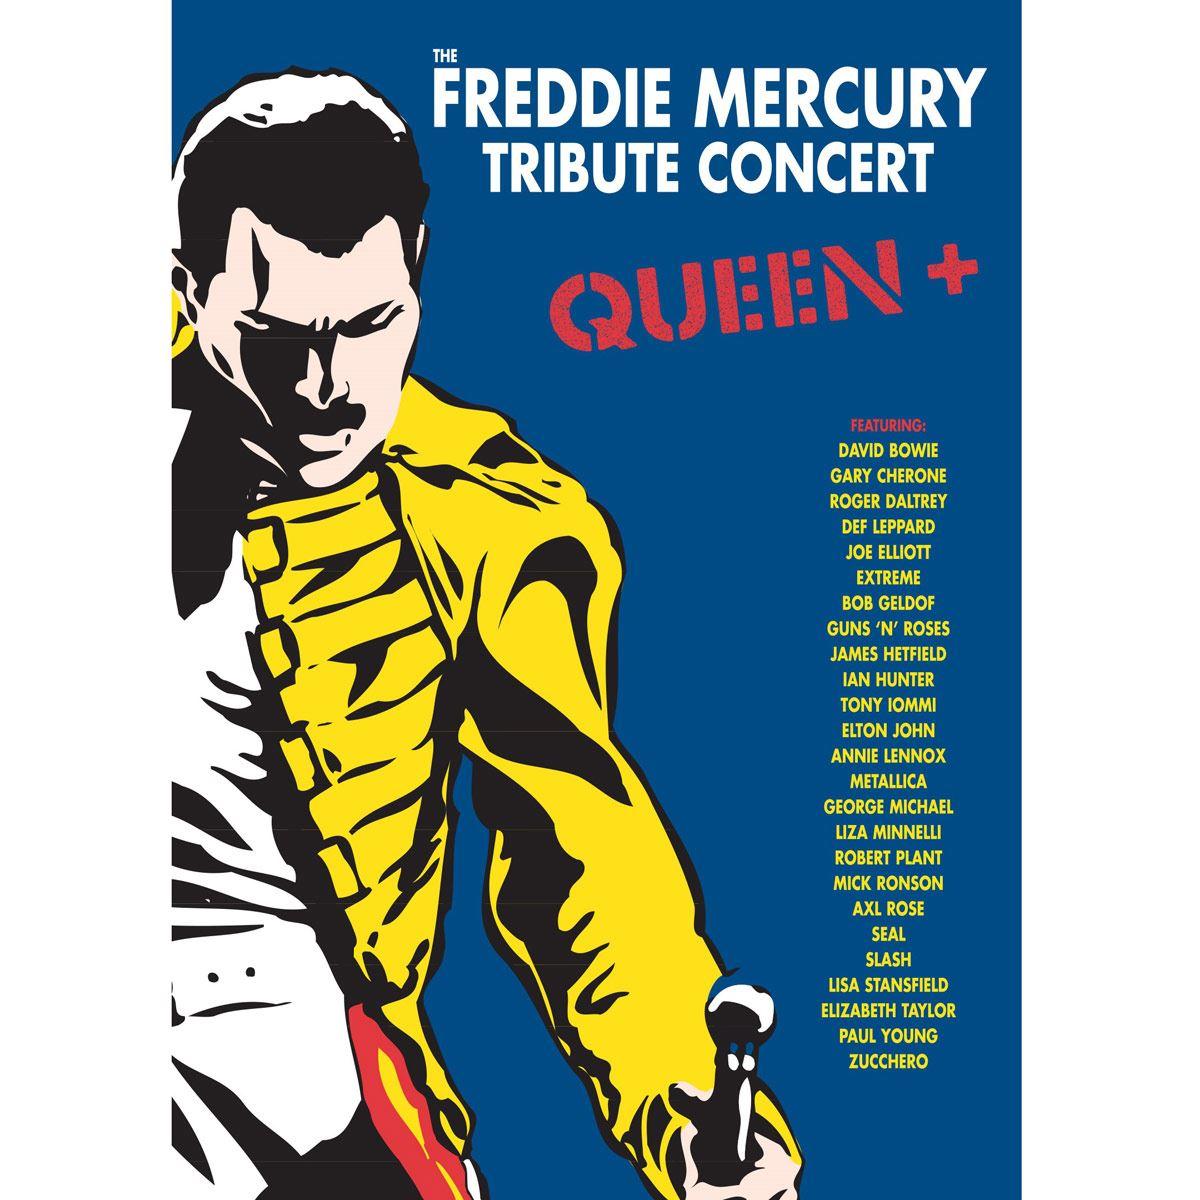 DVD Various Artists- The Freddie Mercury Tribute Concert Queen+